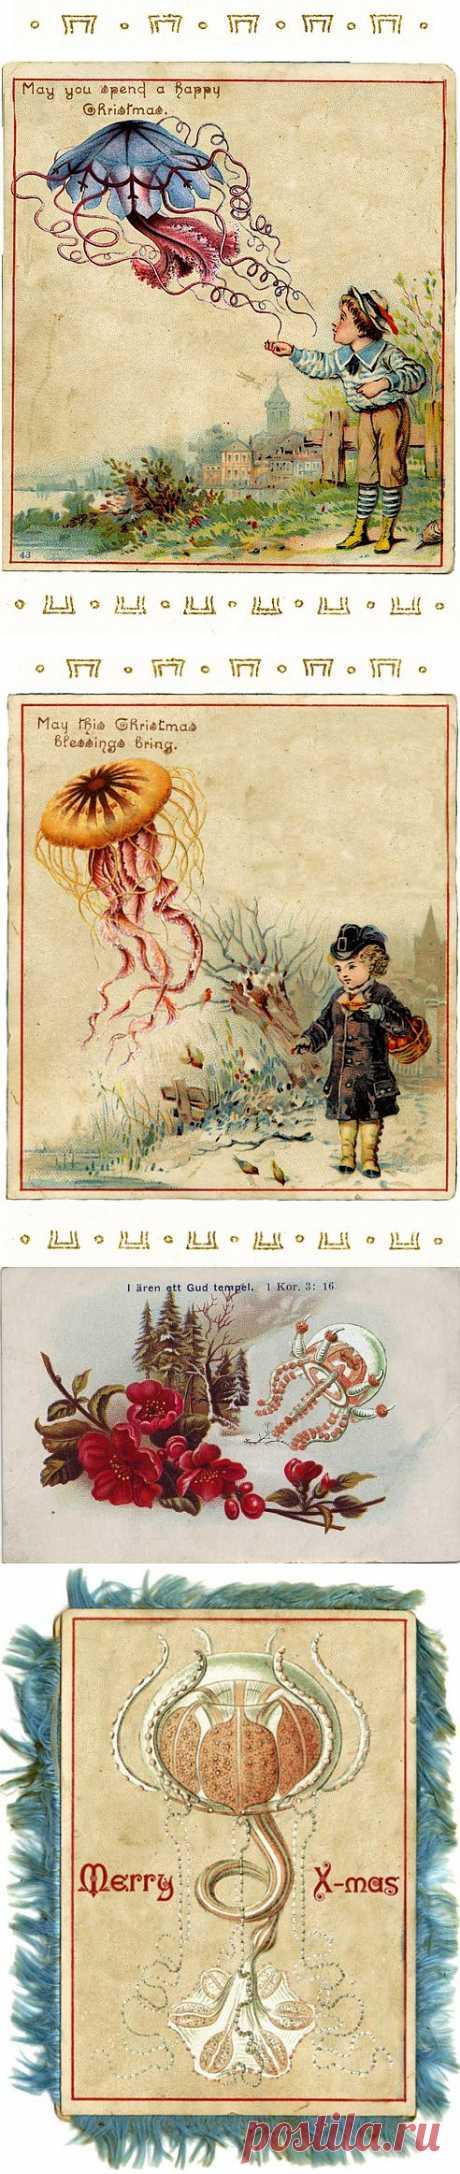 Ernst Haeckel's Christmas Cards викторианского времени.